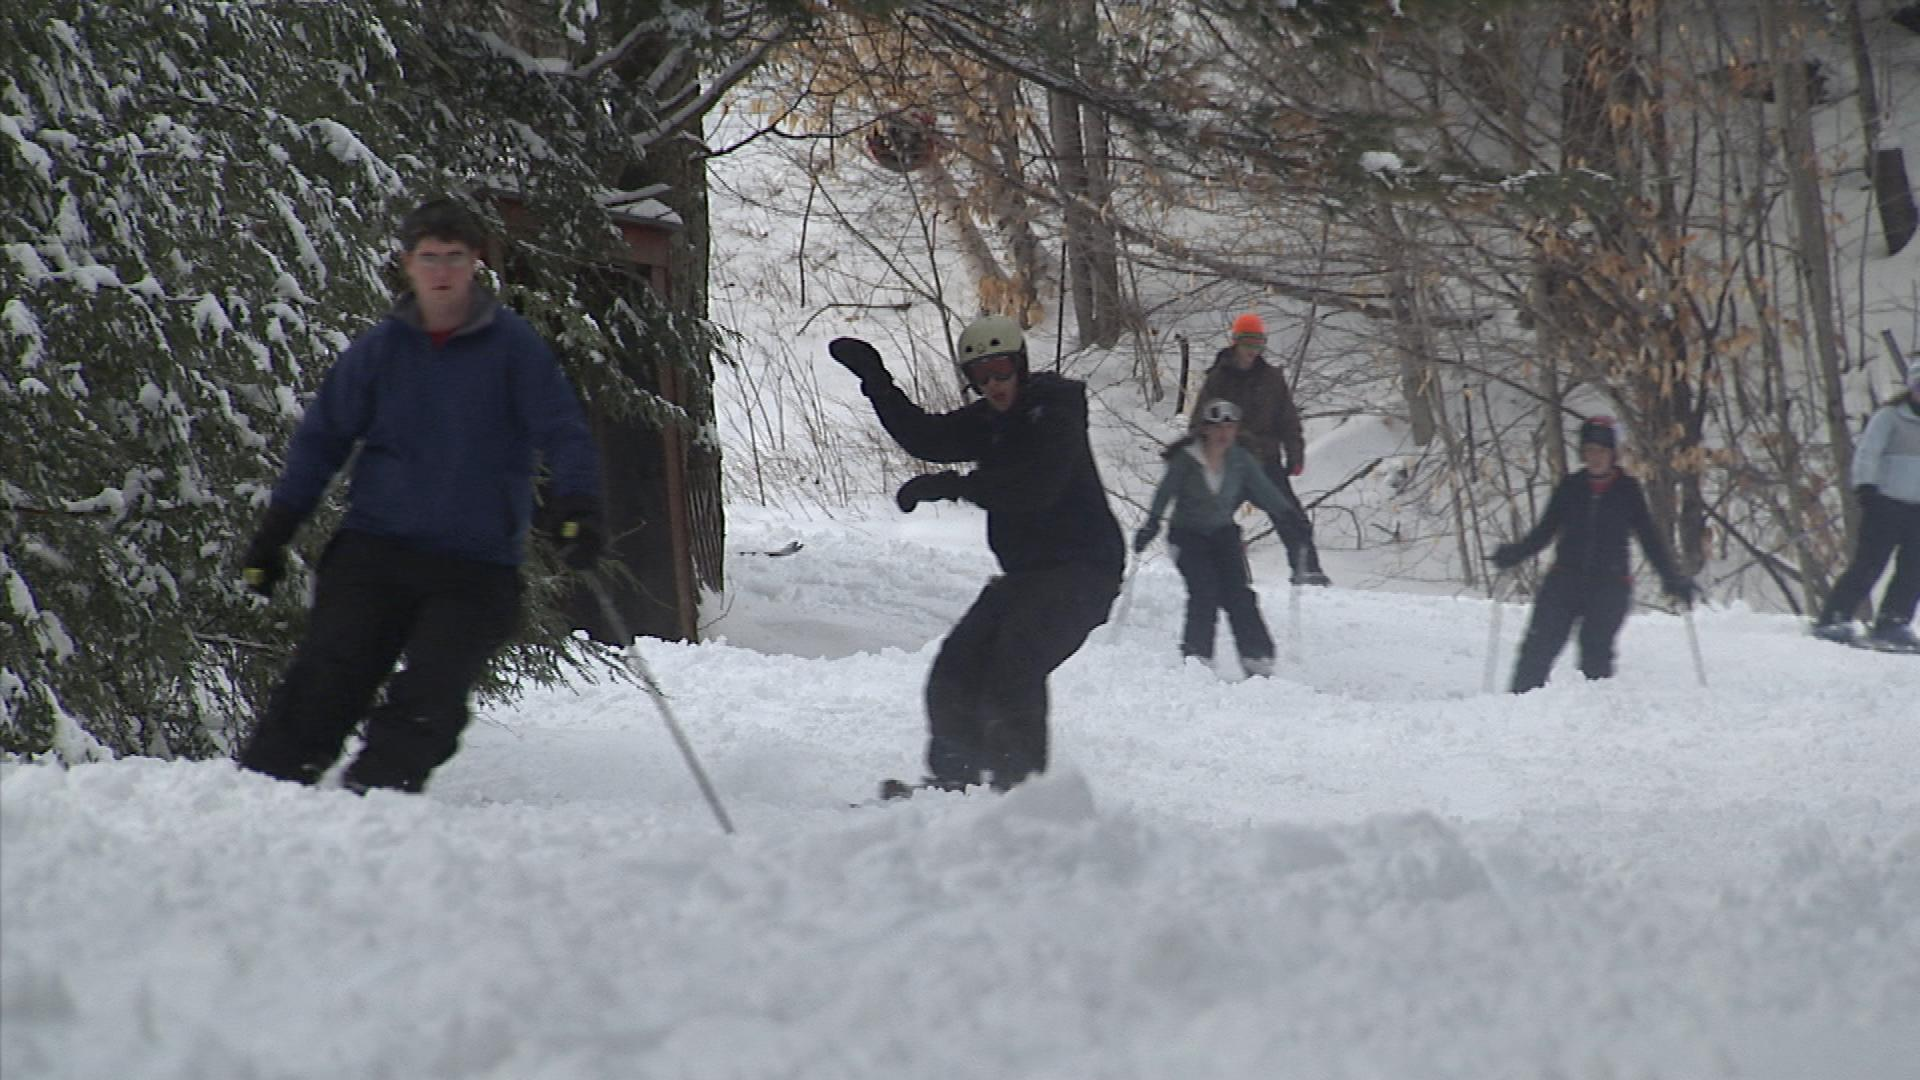 Western Mass ski areas prep for pandemic ski season